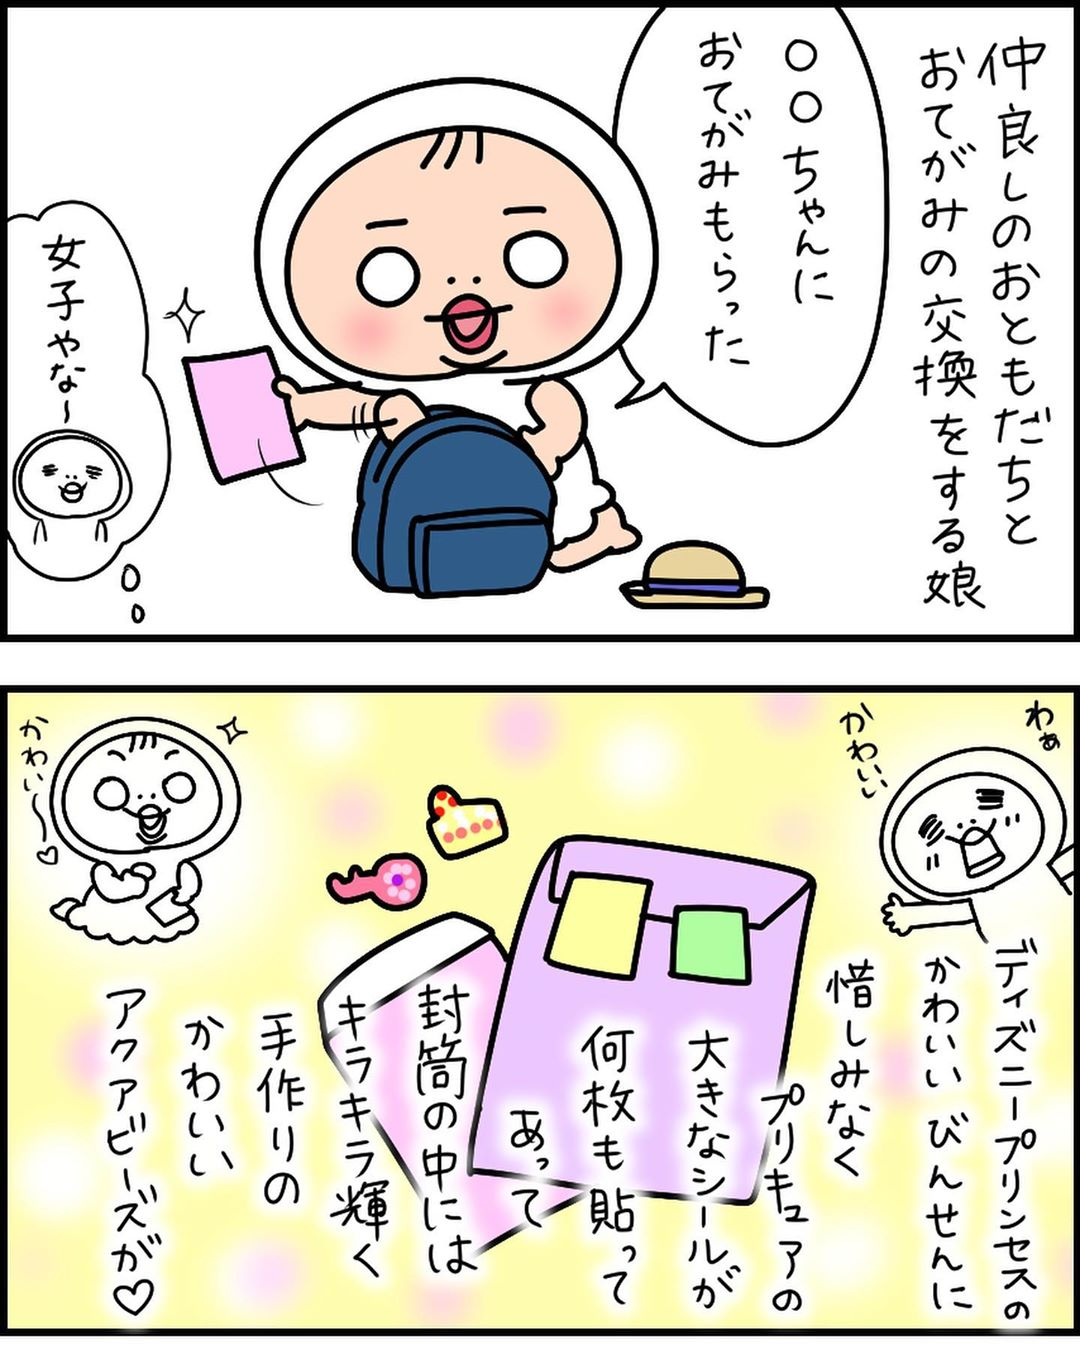 nikunohi029_66446098_131026578114230_8014531223040543943_n